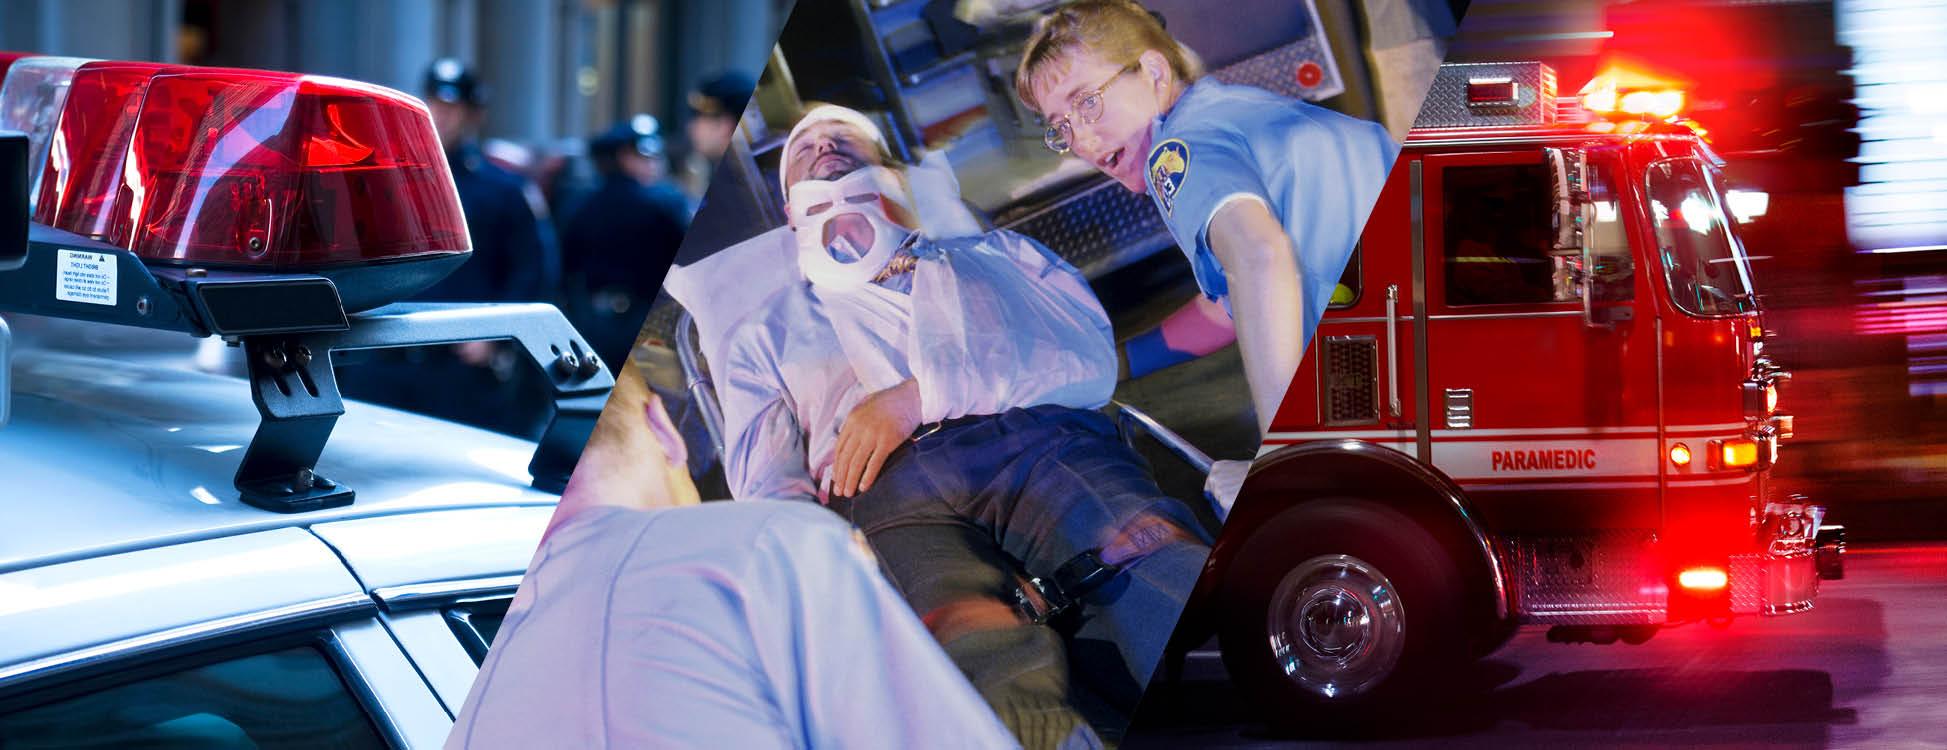 Law Enforcement, Emergency Medical Services, Fire & Rescue